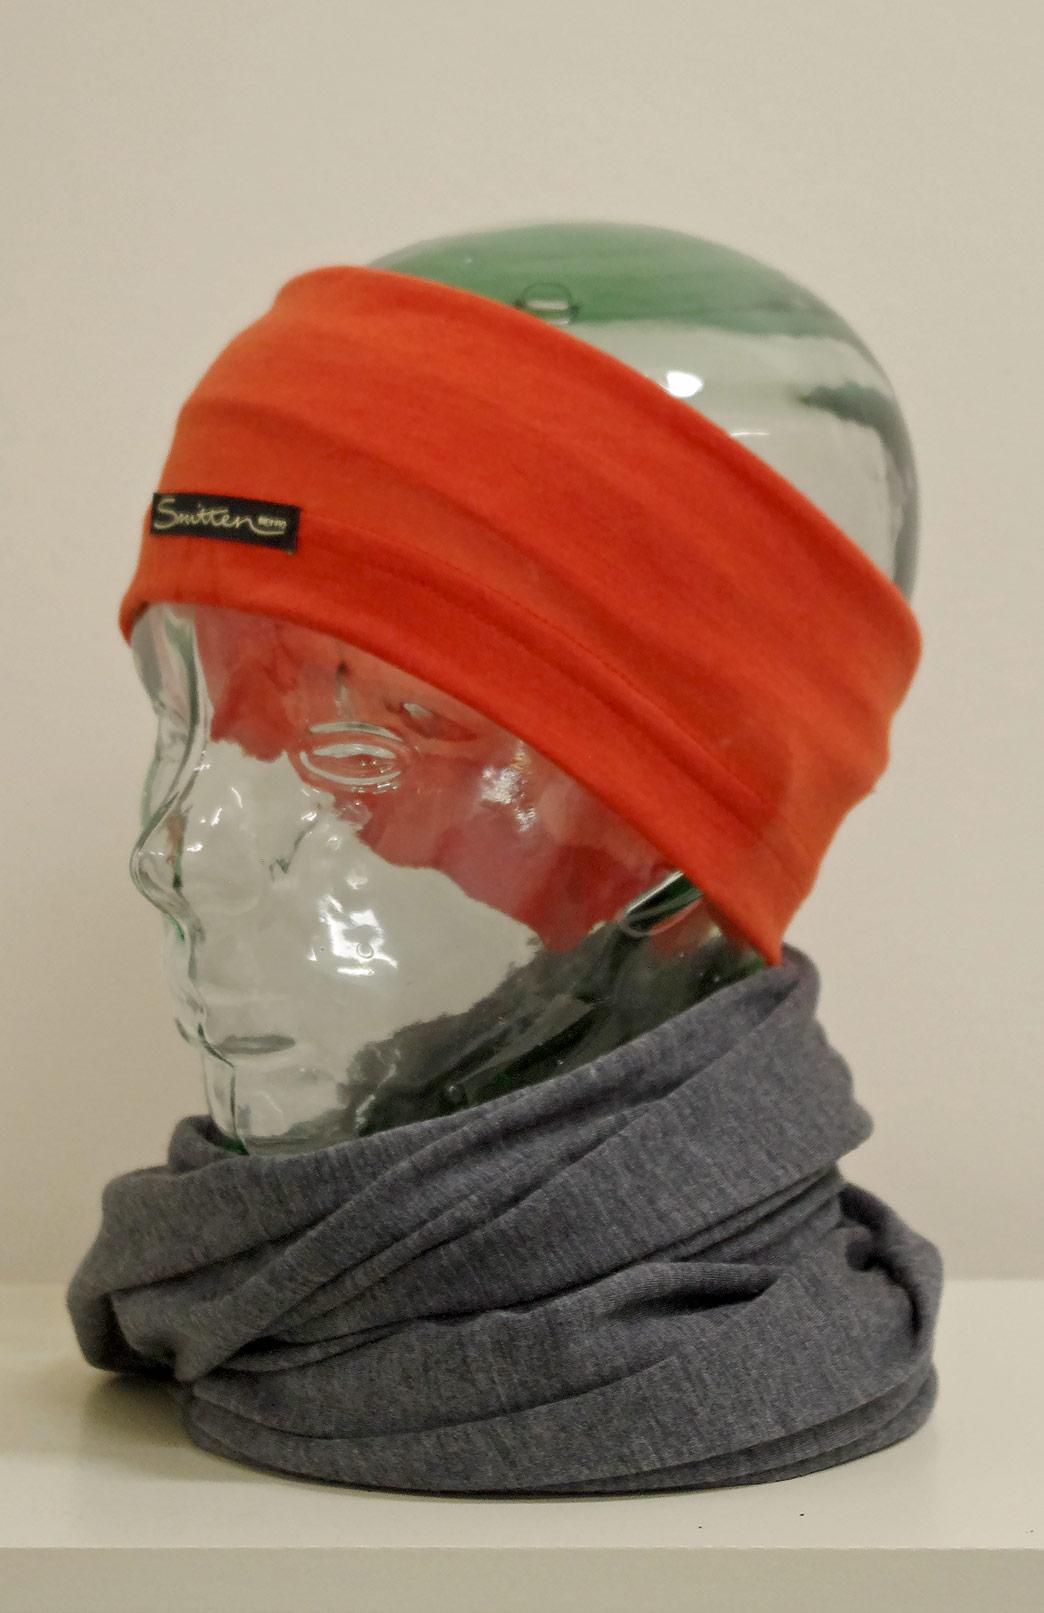 Headband / Ear Warmer - Unisex paprika Orange Stripe Merino Wool Headband and Ear Warmer - Smitten Merino Tasmania Australia